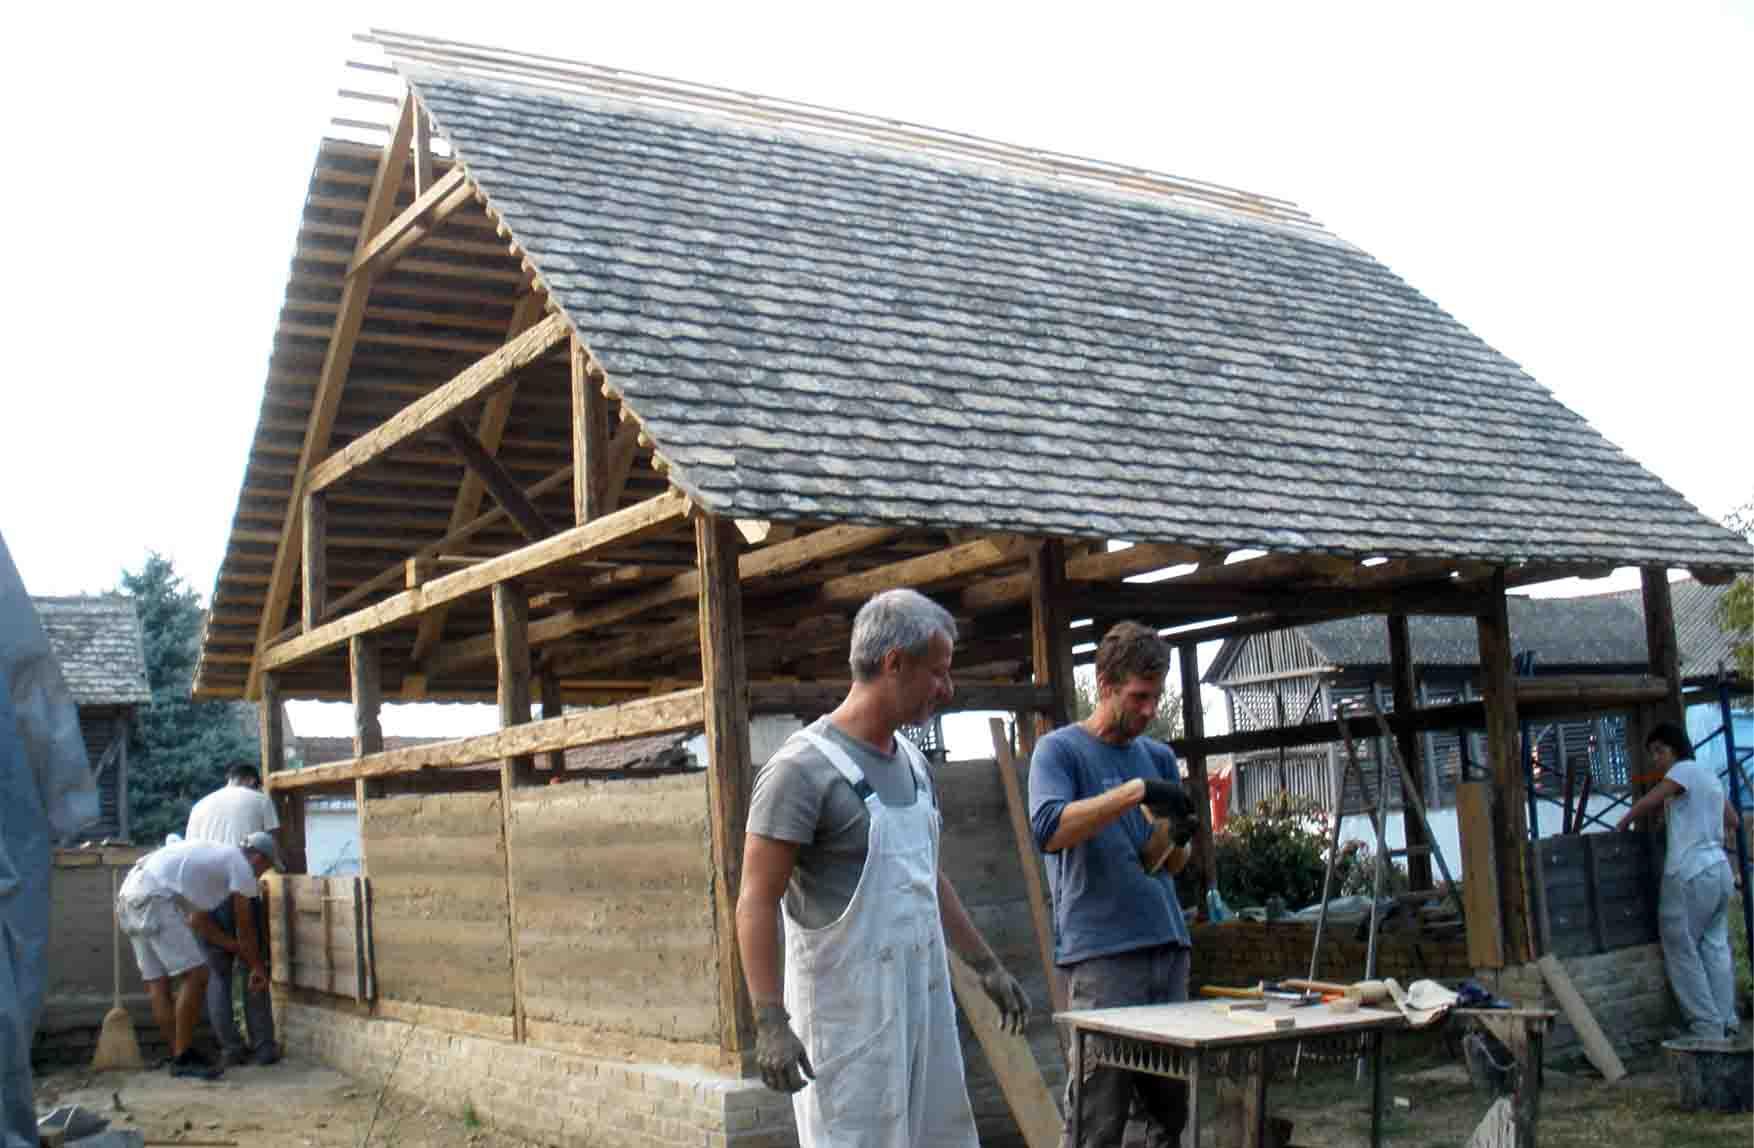 01-mora-2016-mosorin-skola-zemljane-arhitekture